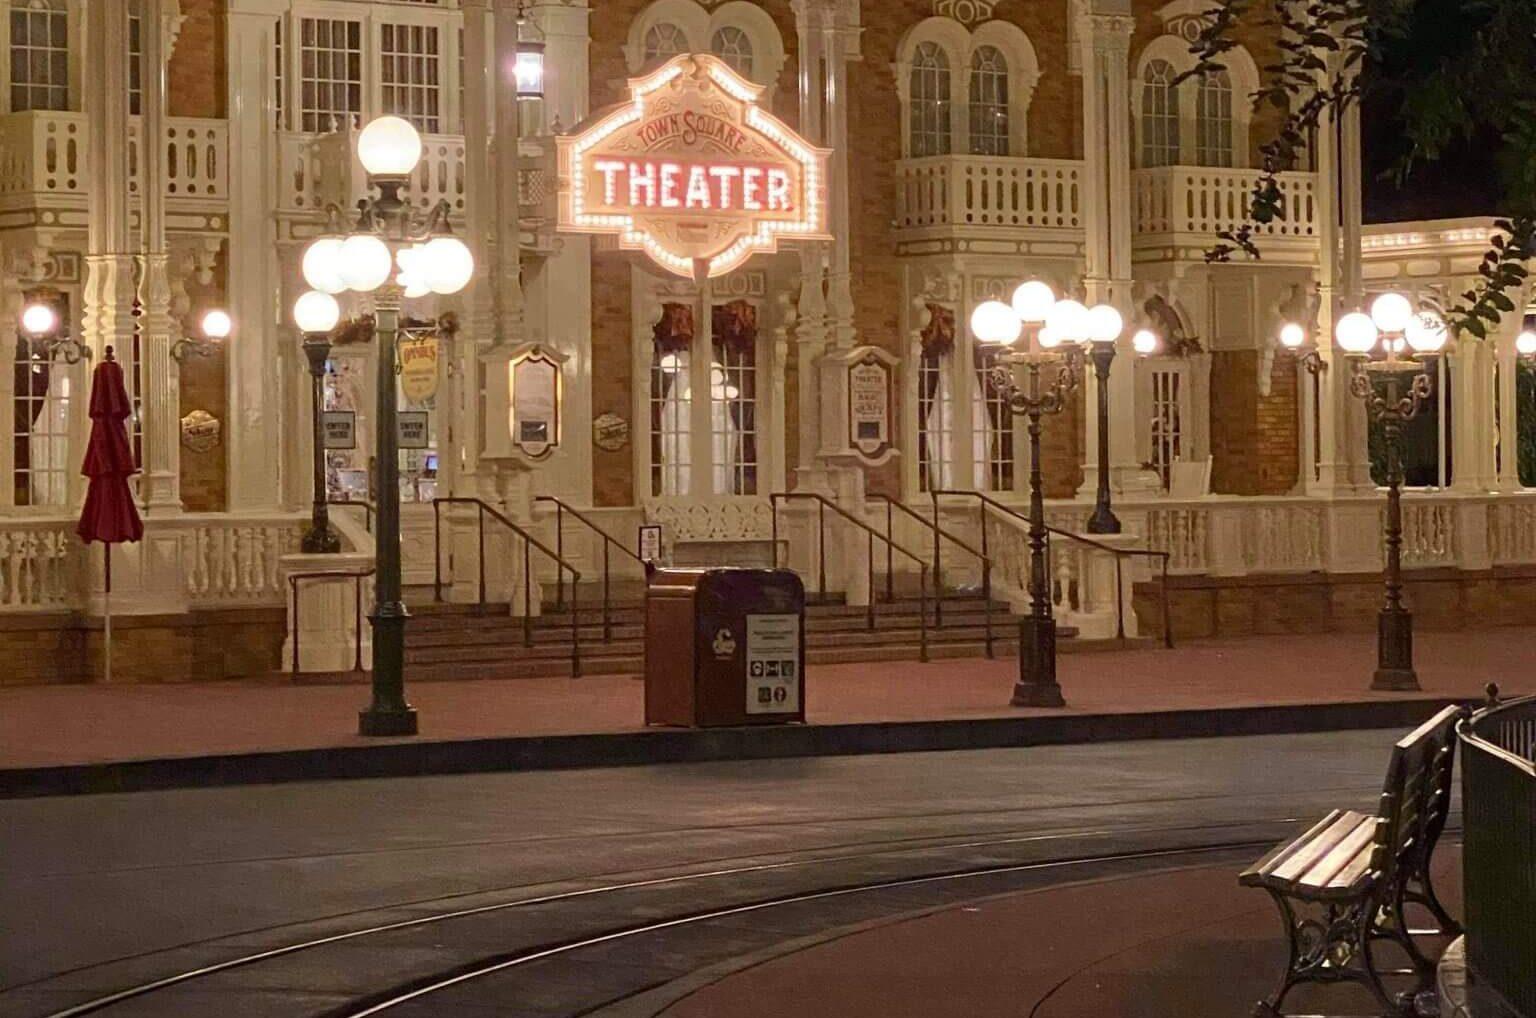 New Years Eve 2020 Hours at Walt Disney World Revealed - Theme Park Professor